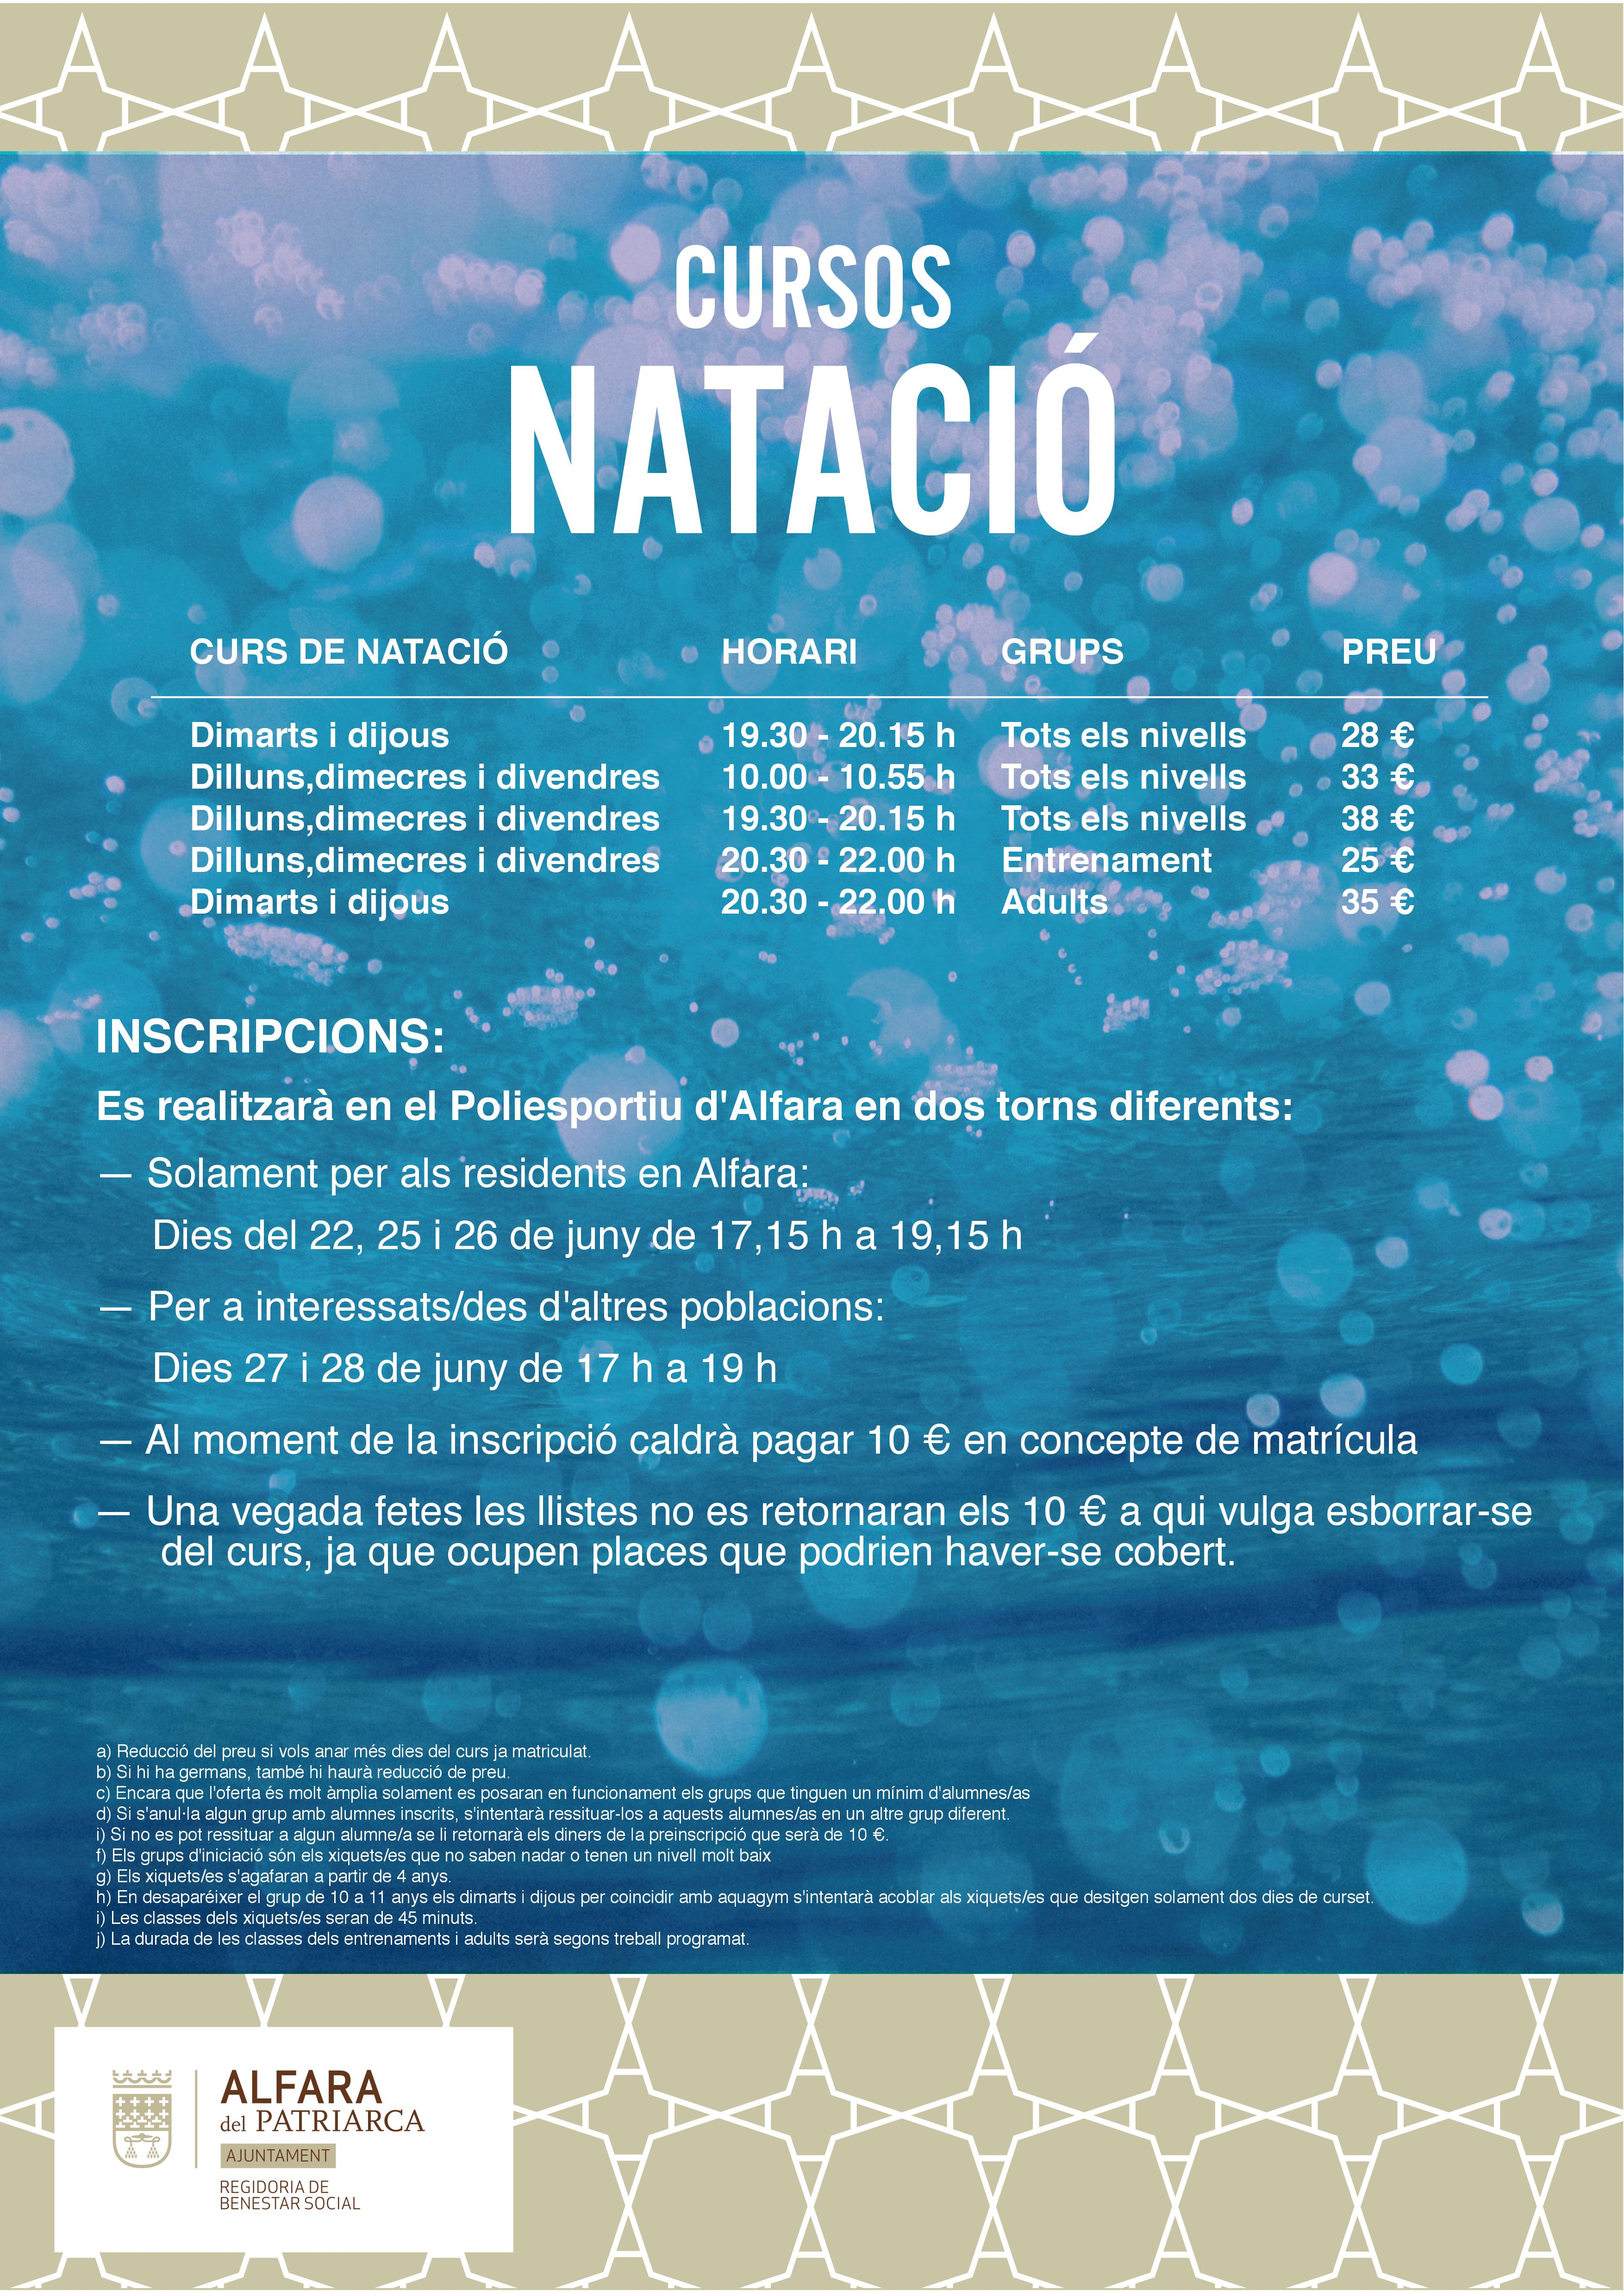 CURS NATACIO 2018